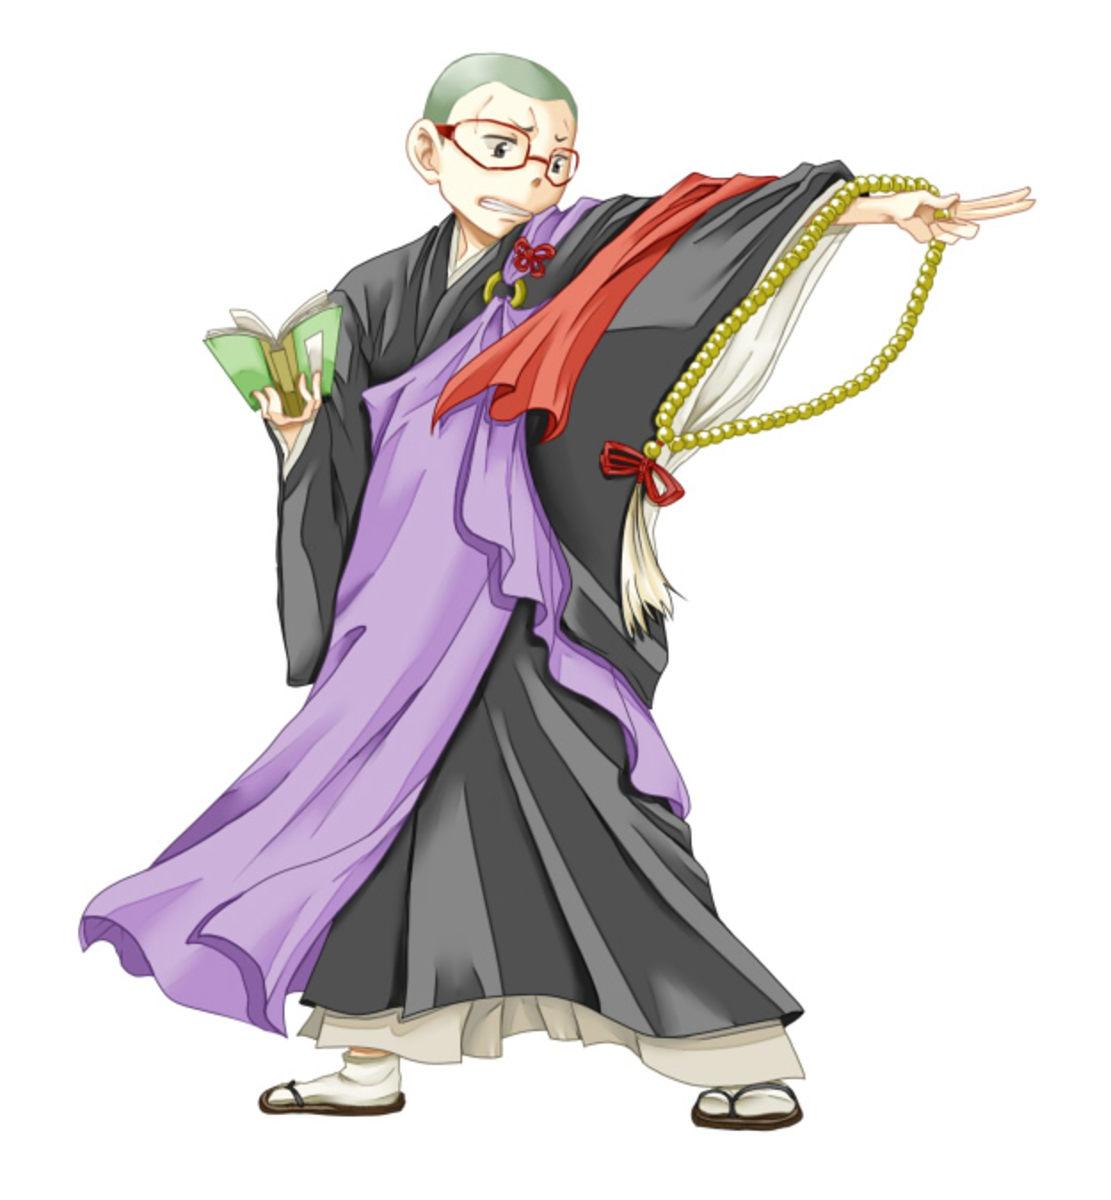 Konekomaru Miwa.